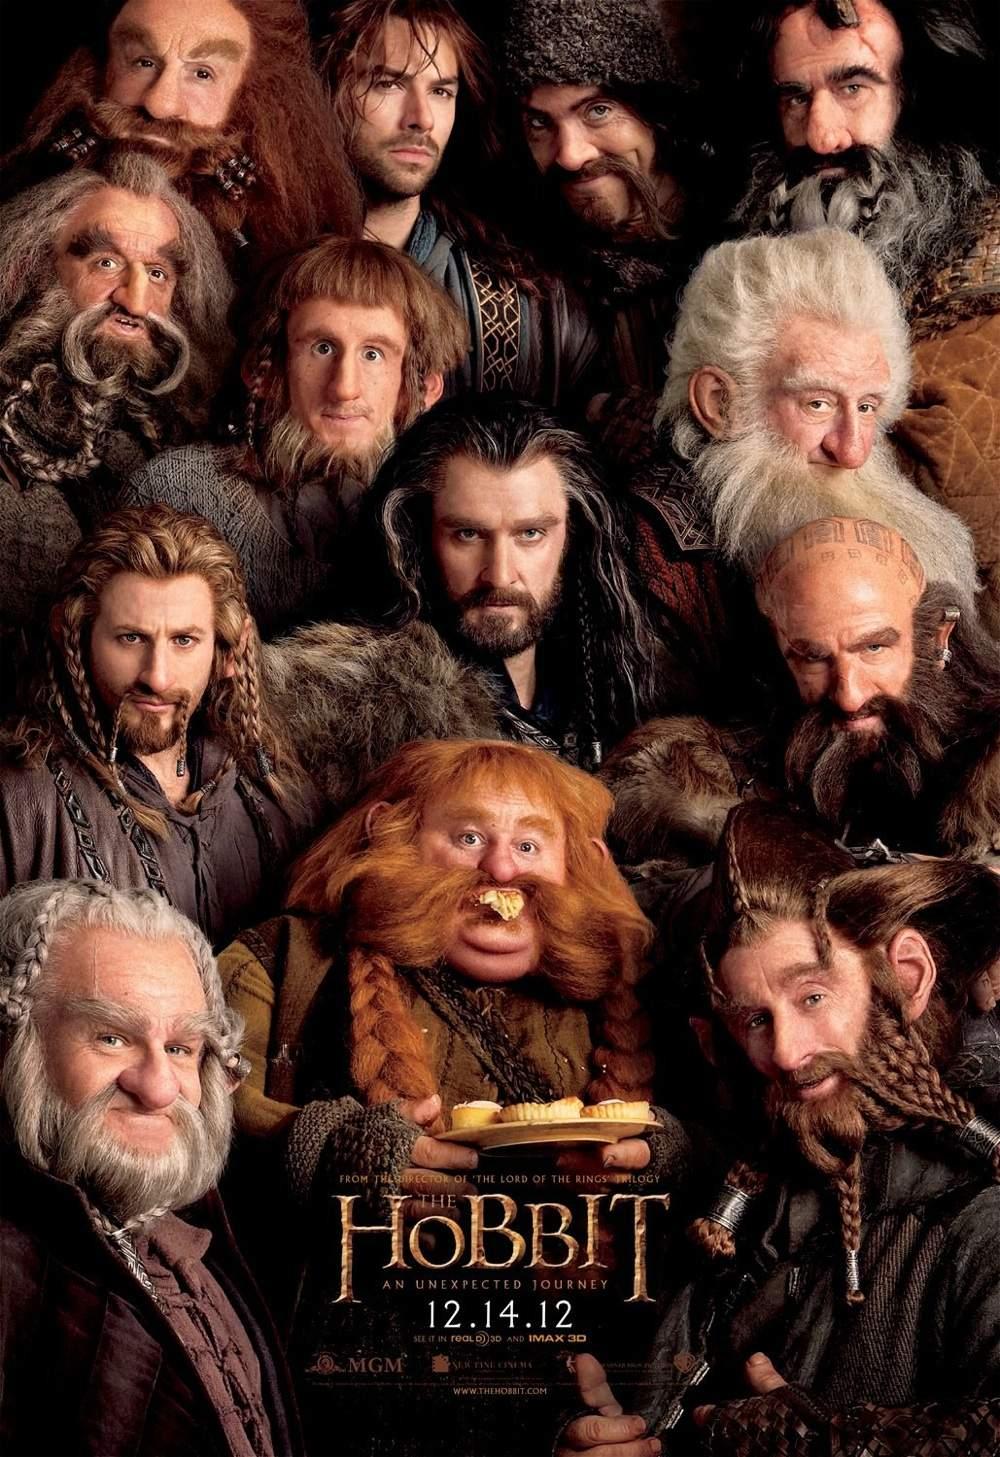 The Hobbit – An Unexpected Journey – Stăpânul belelelor!